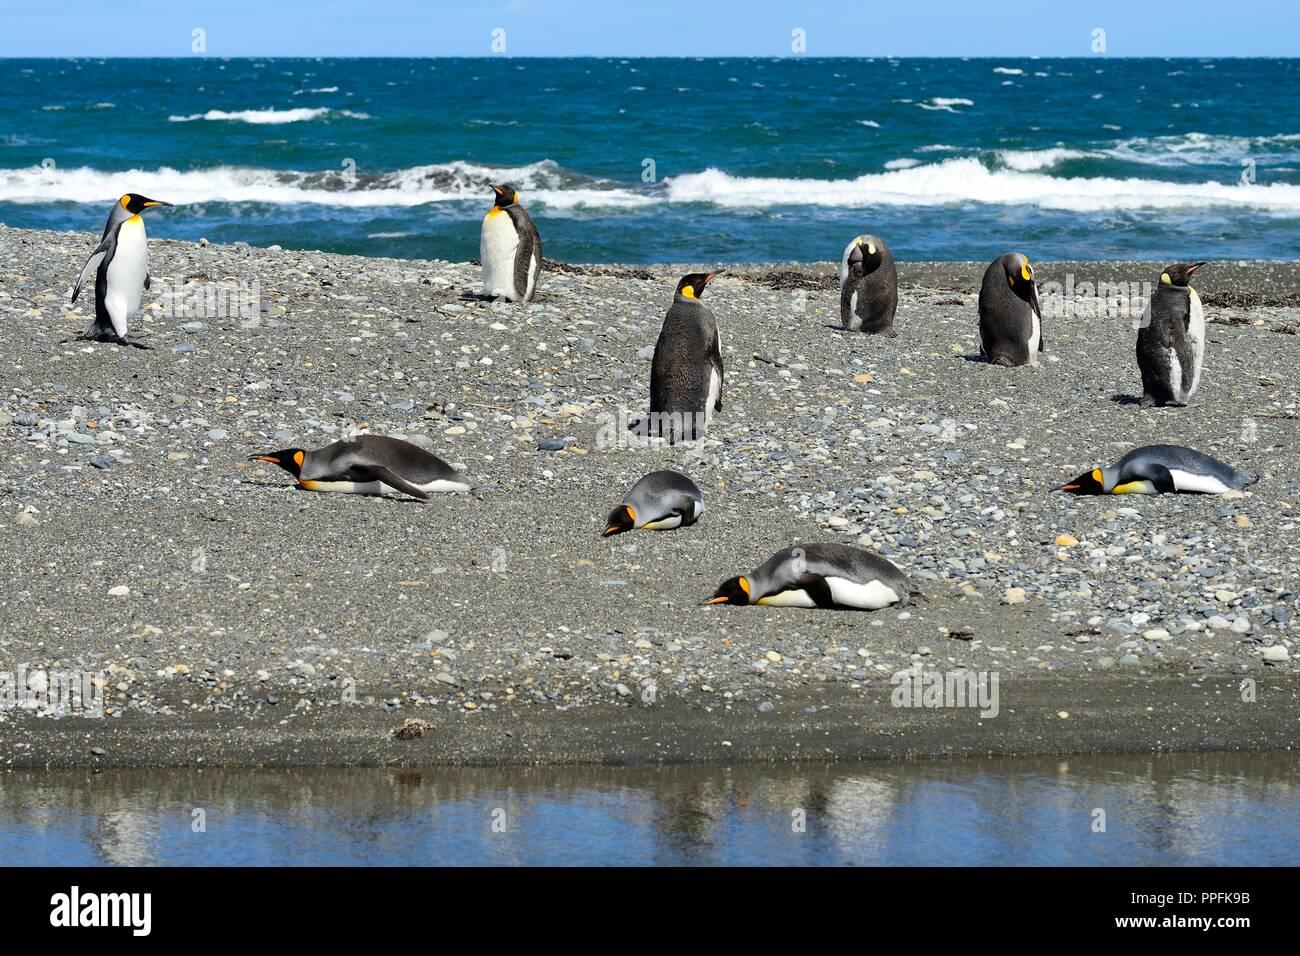 King penguins (Aptenodytes patagonicus), colony on gravel bank at Bahia Inutil, Parque Pingüino Rey, Porvenir - Stock Image